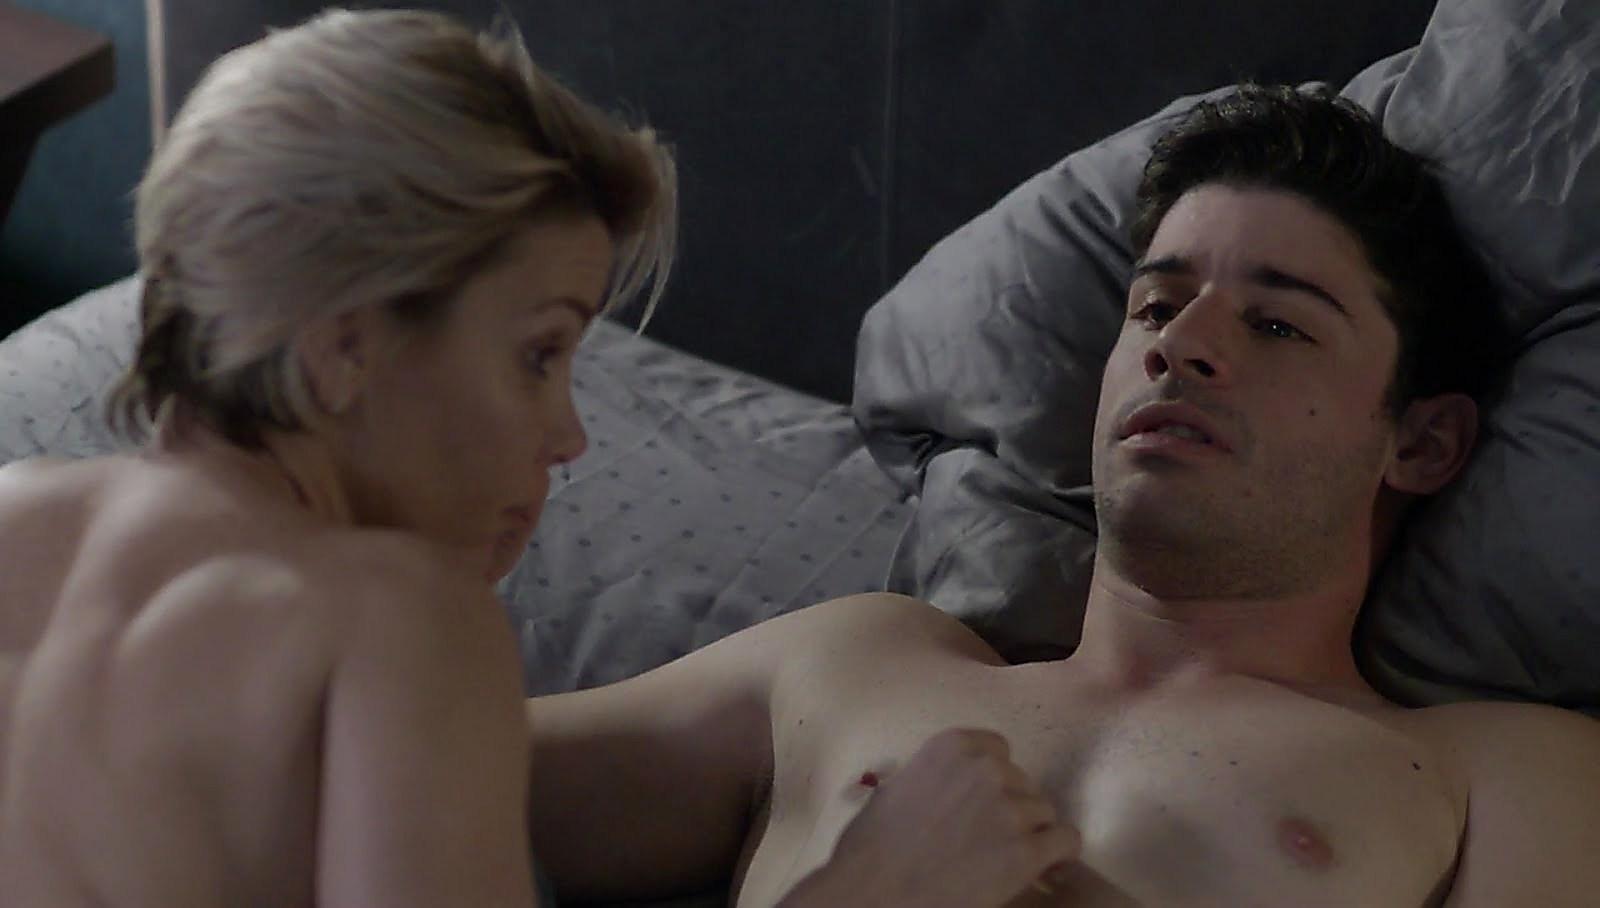 Jonathan Freudman sexy shirtless scene June 11, 2018, 8am